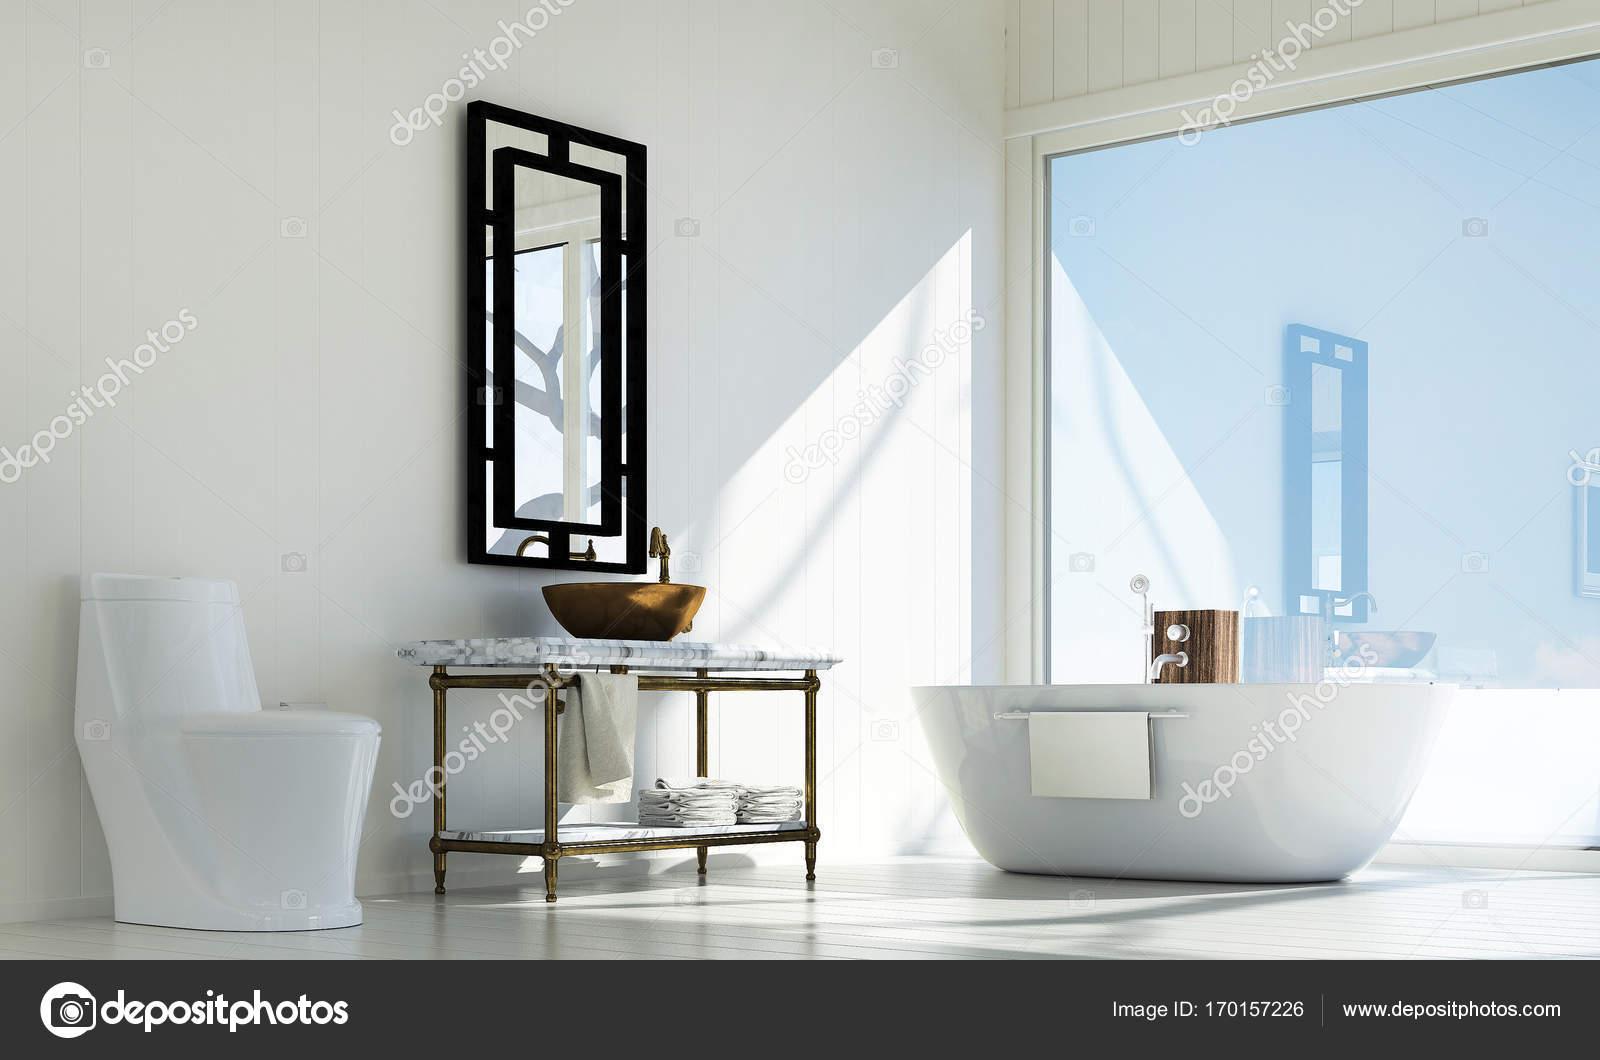 Badkamer Beton Interieur : De moderne badkamer interieur en beton muur textuur achtergrond en